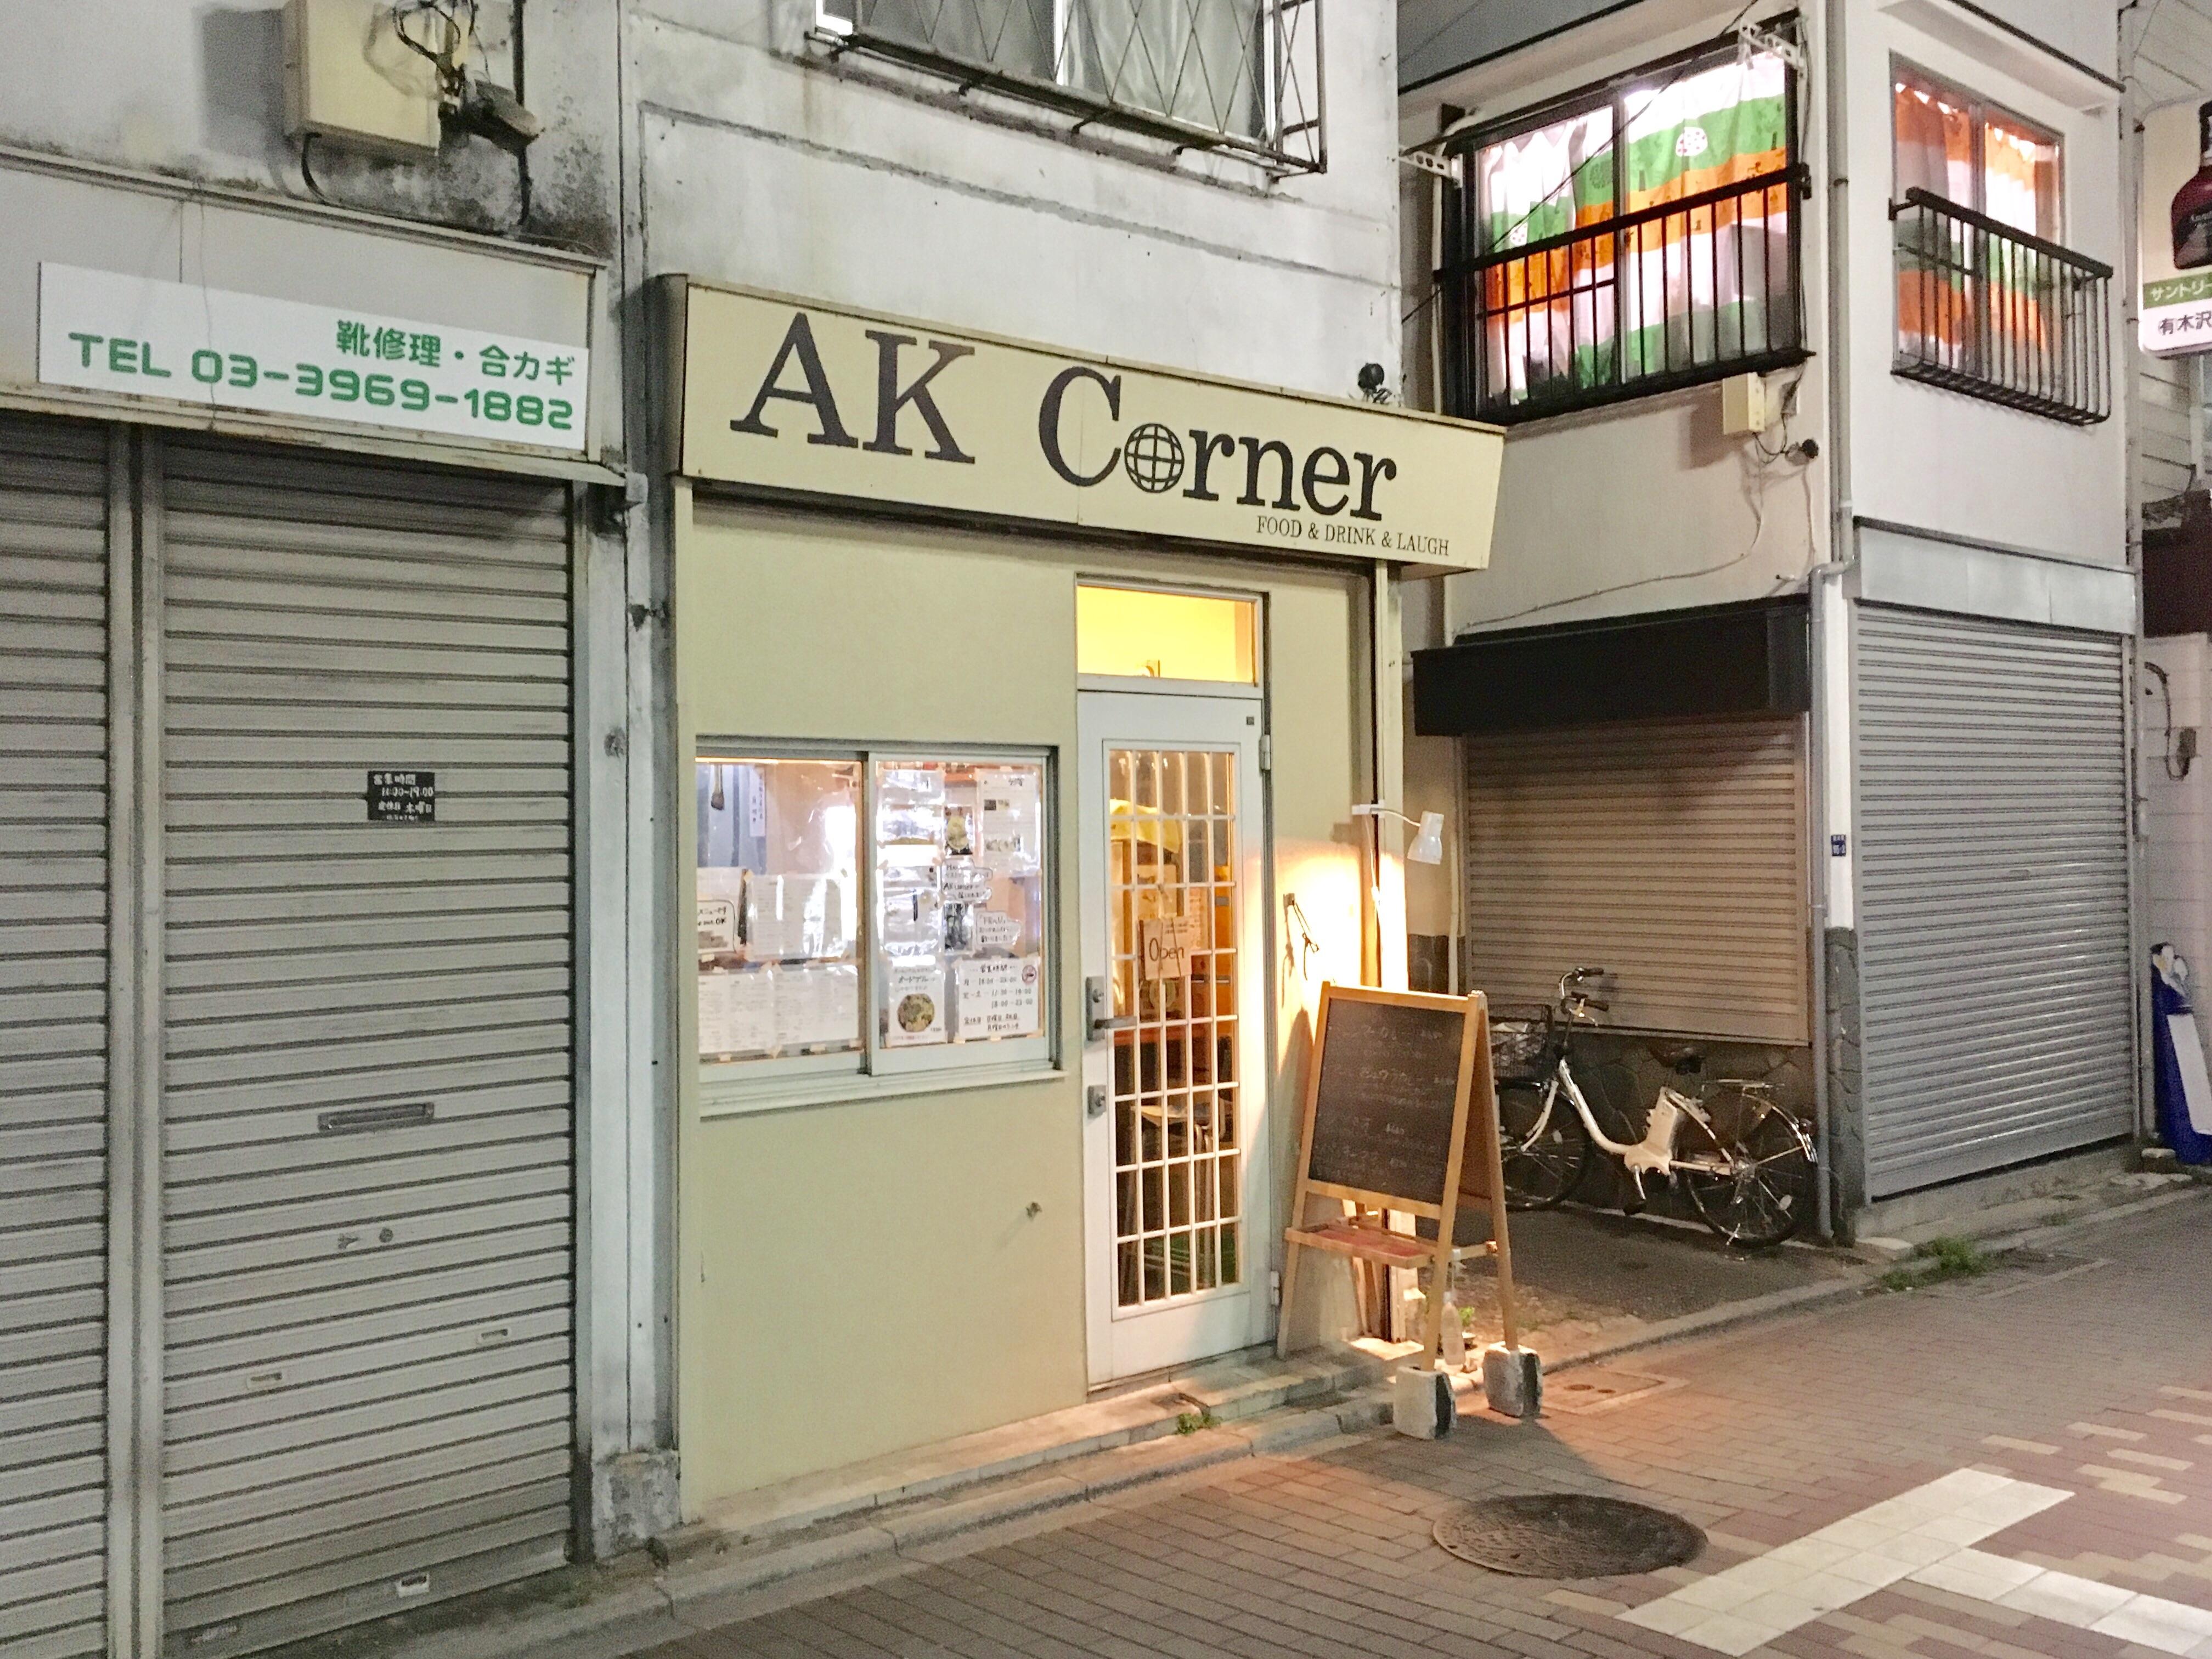 f:id:SoichiroIkeshita:20180110190249j:image